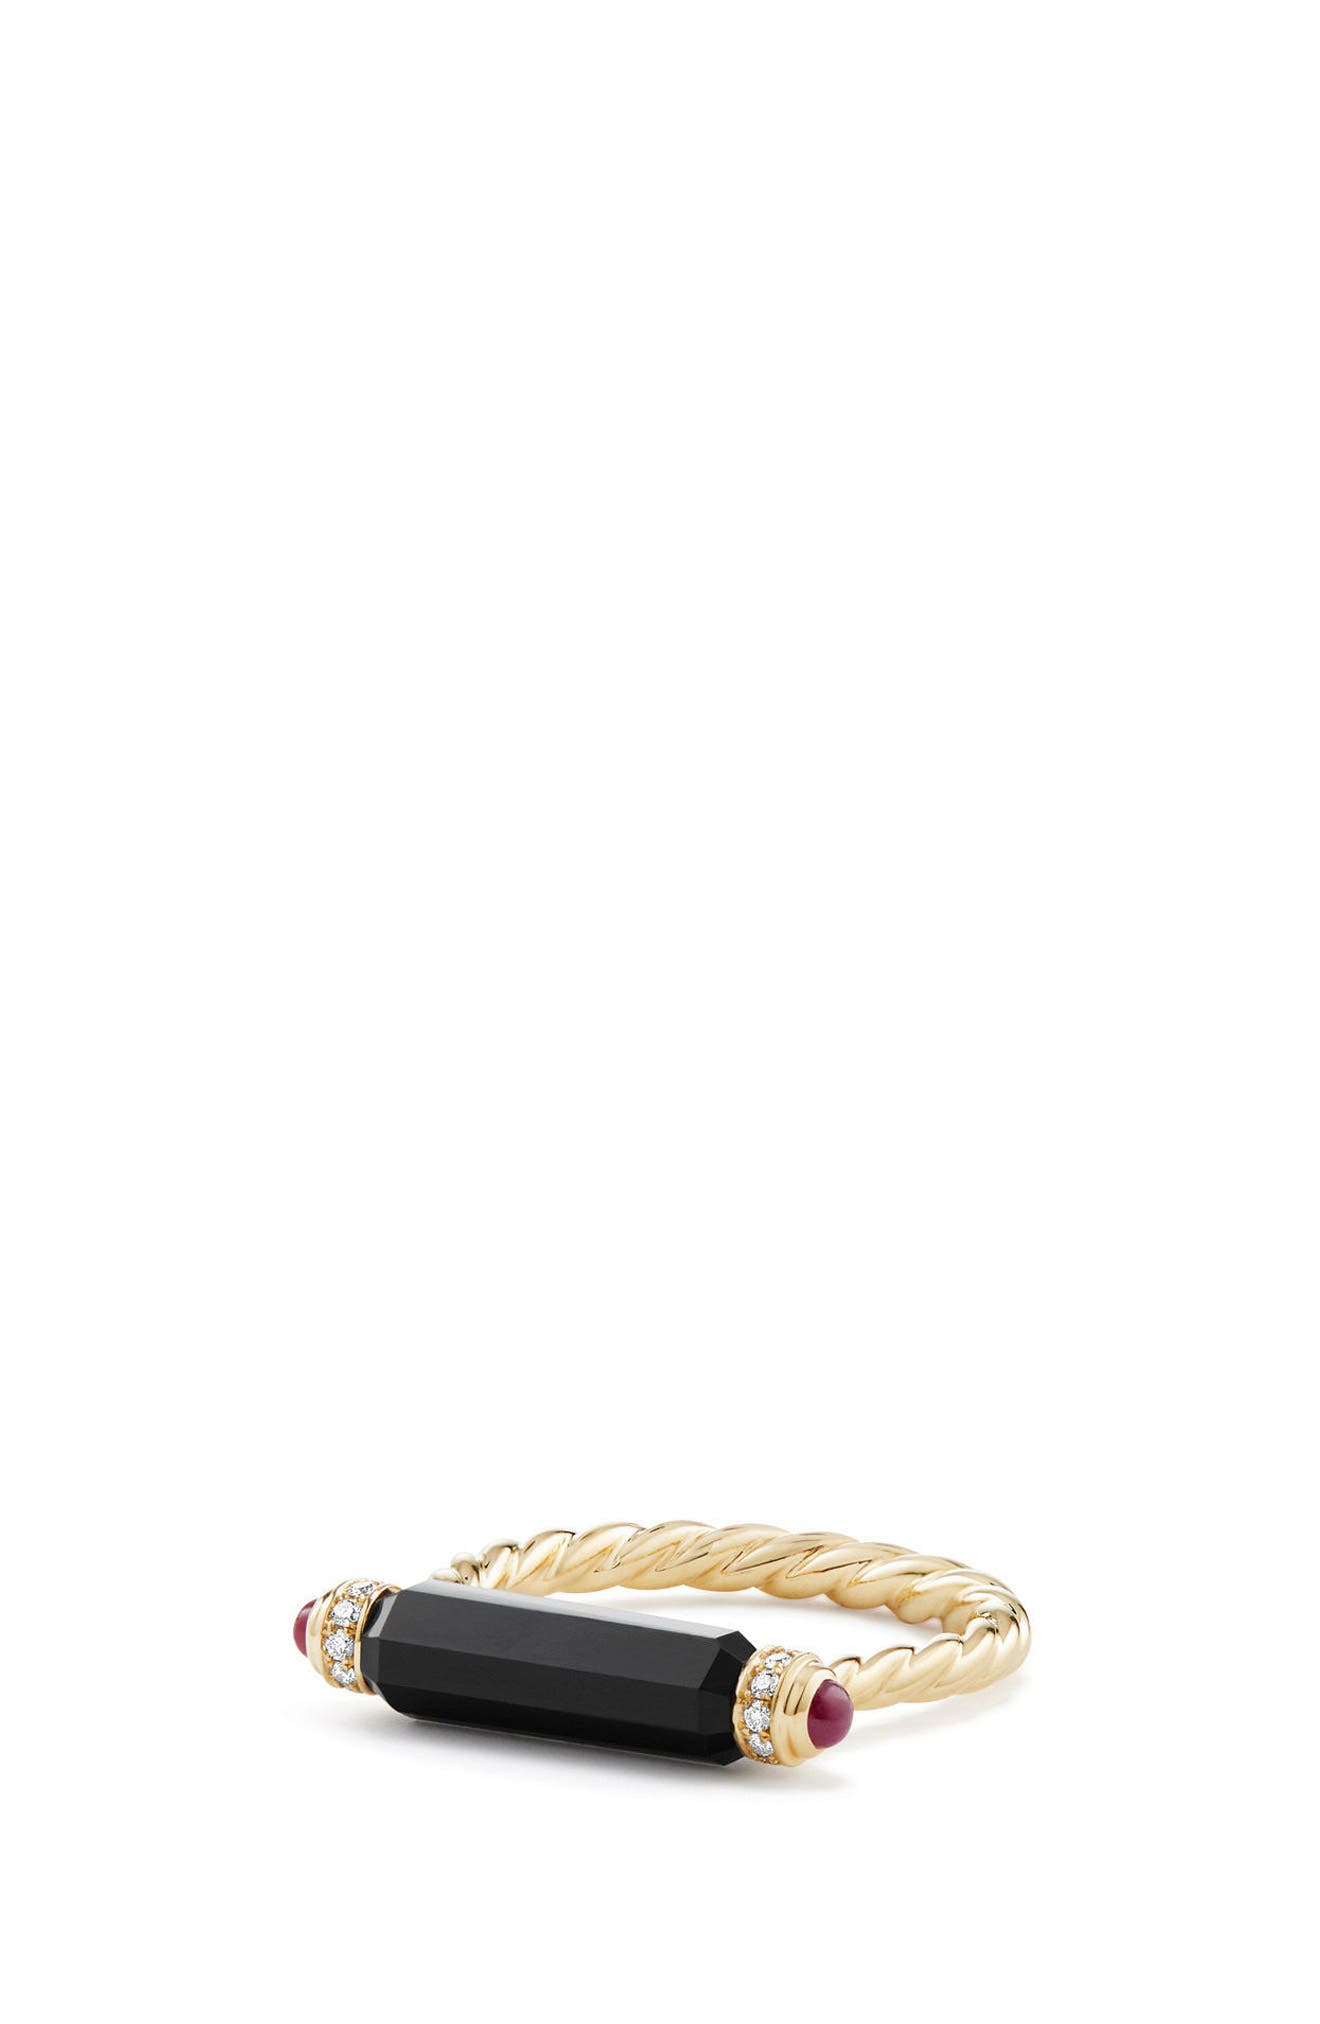 DAVID YURMAN, Barrels Ring with Diamonds in 18K Gold, Main thumbnail 1, color, BLACK ONYX